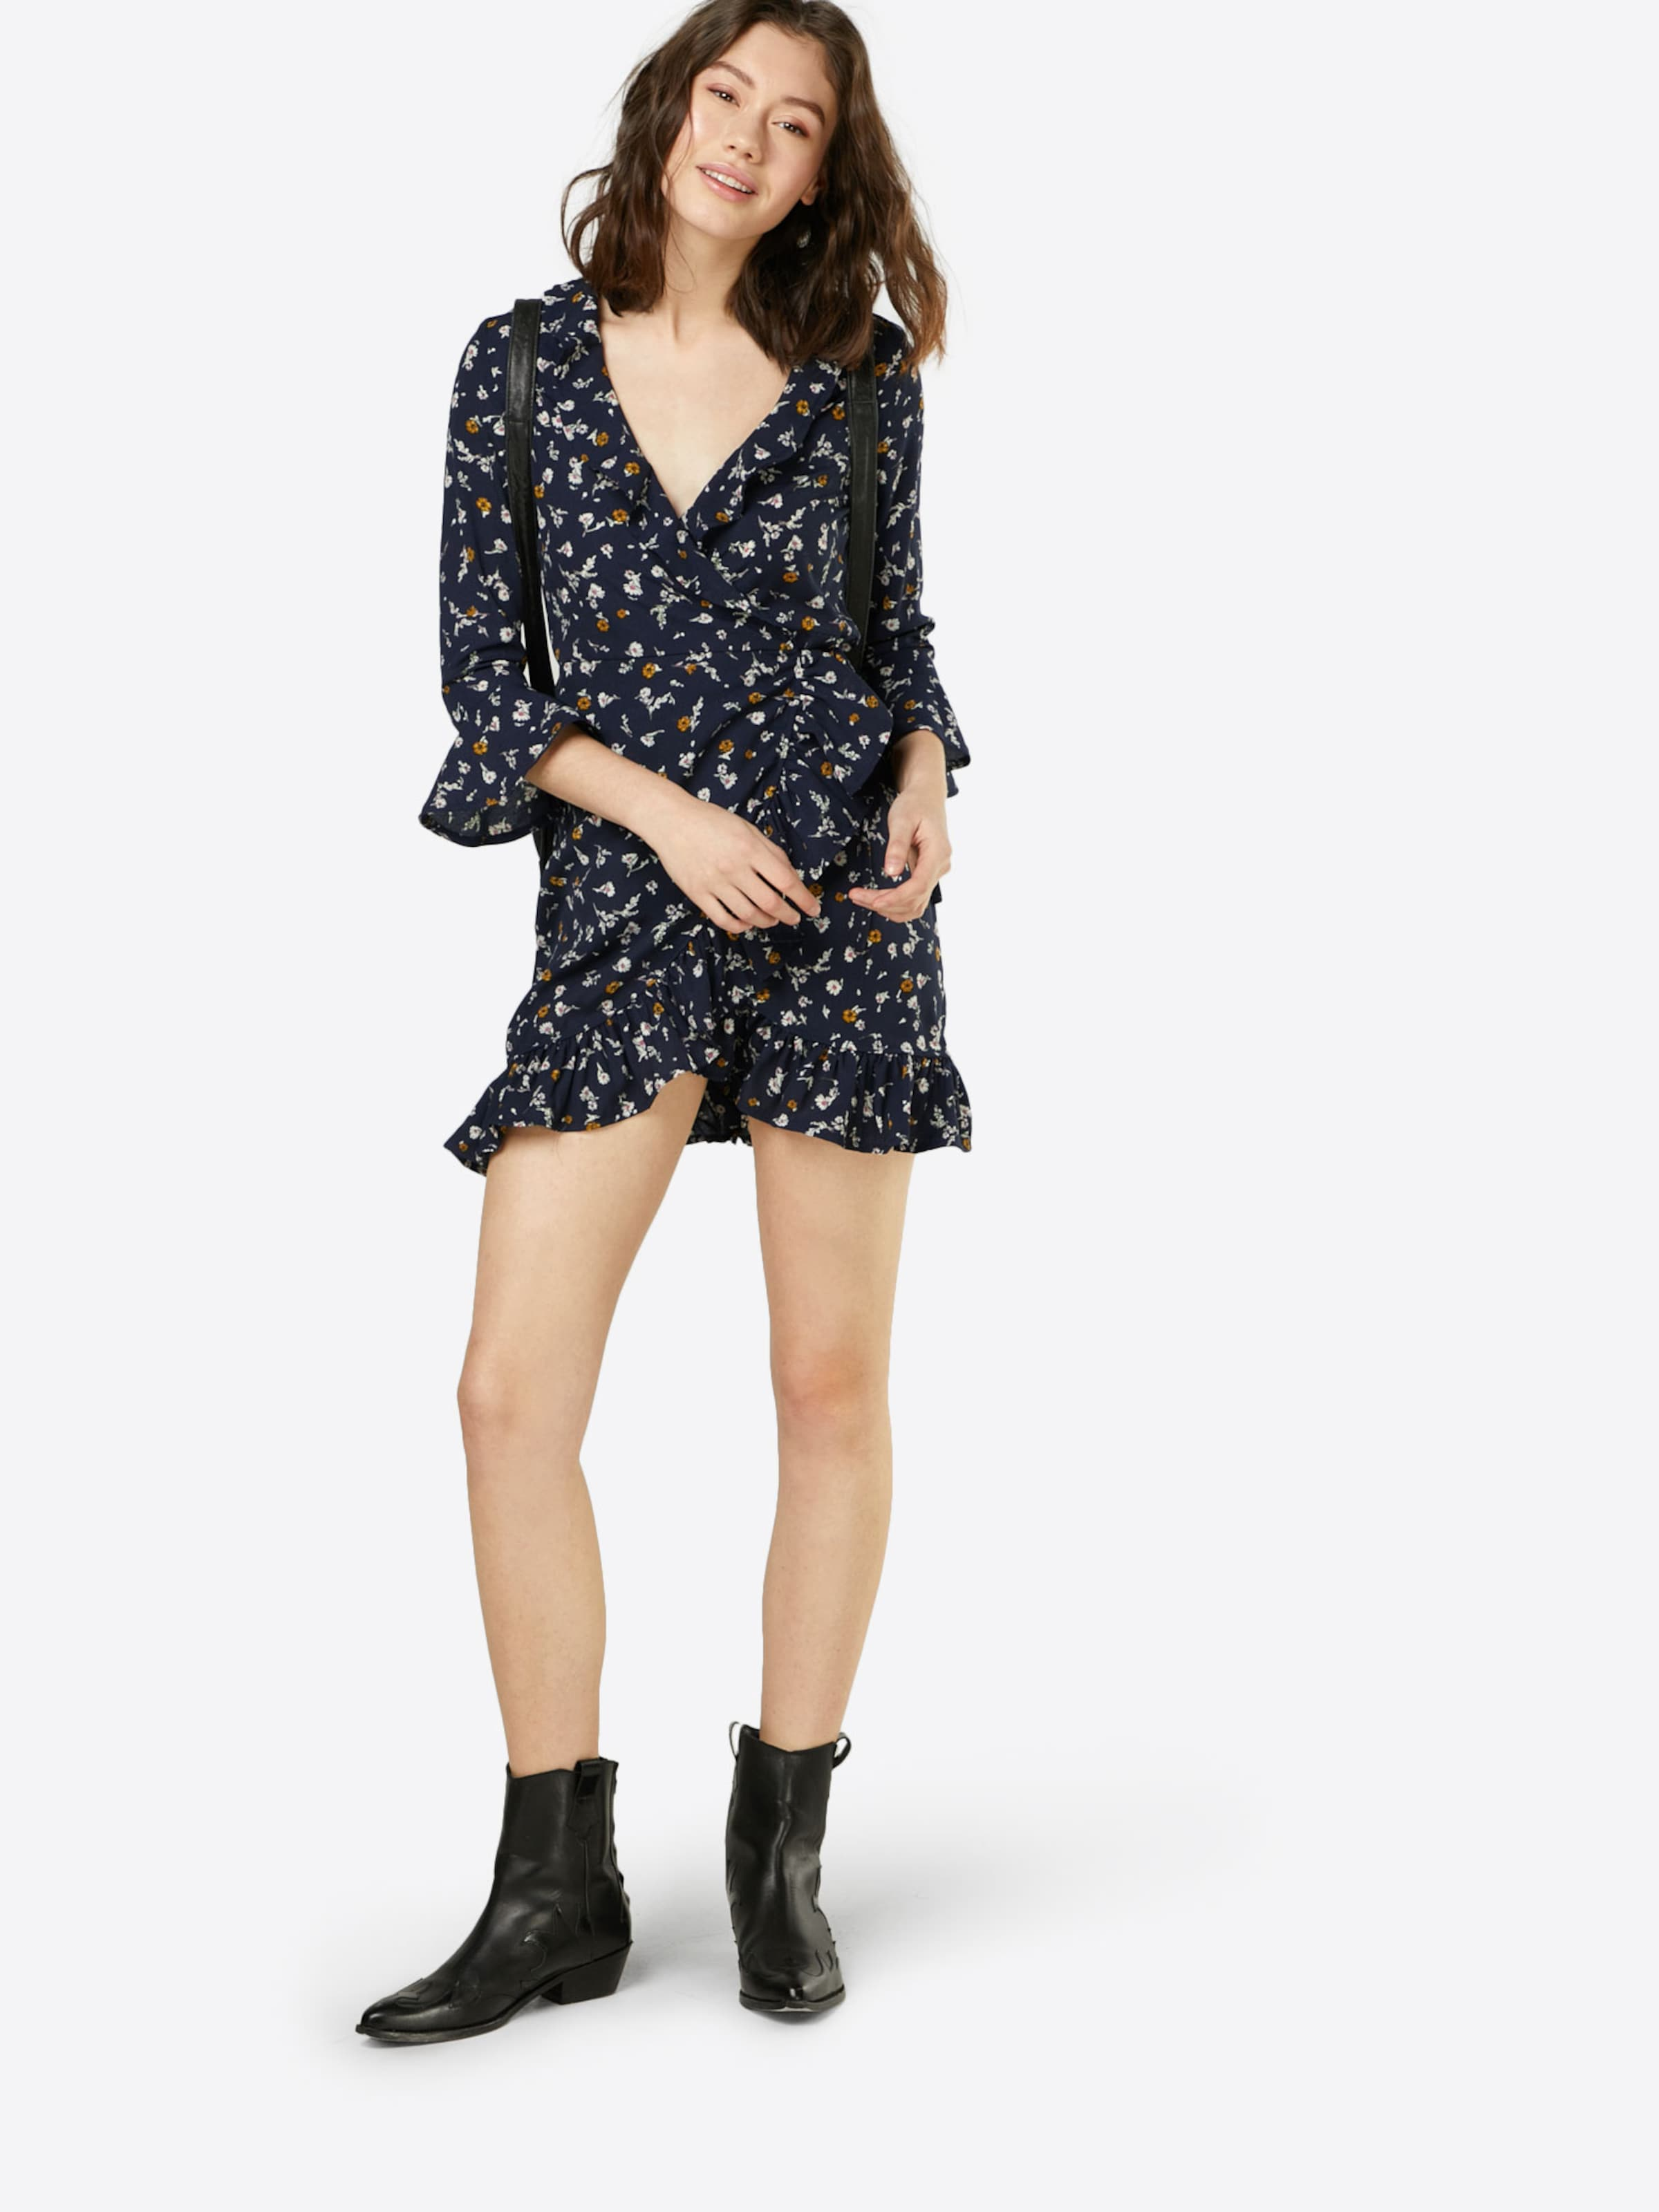 Boohoo En 'bethany Floral' NuitBlanc Robe Bleu xdBorCe